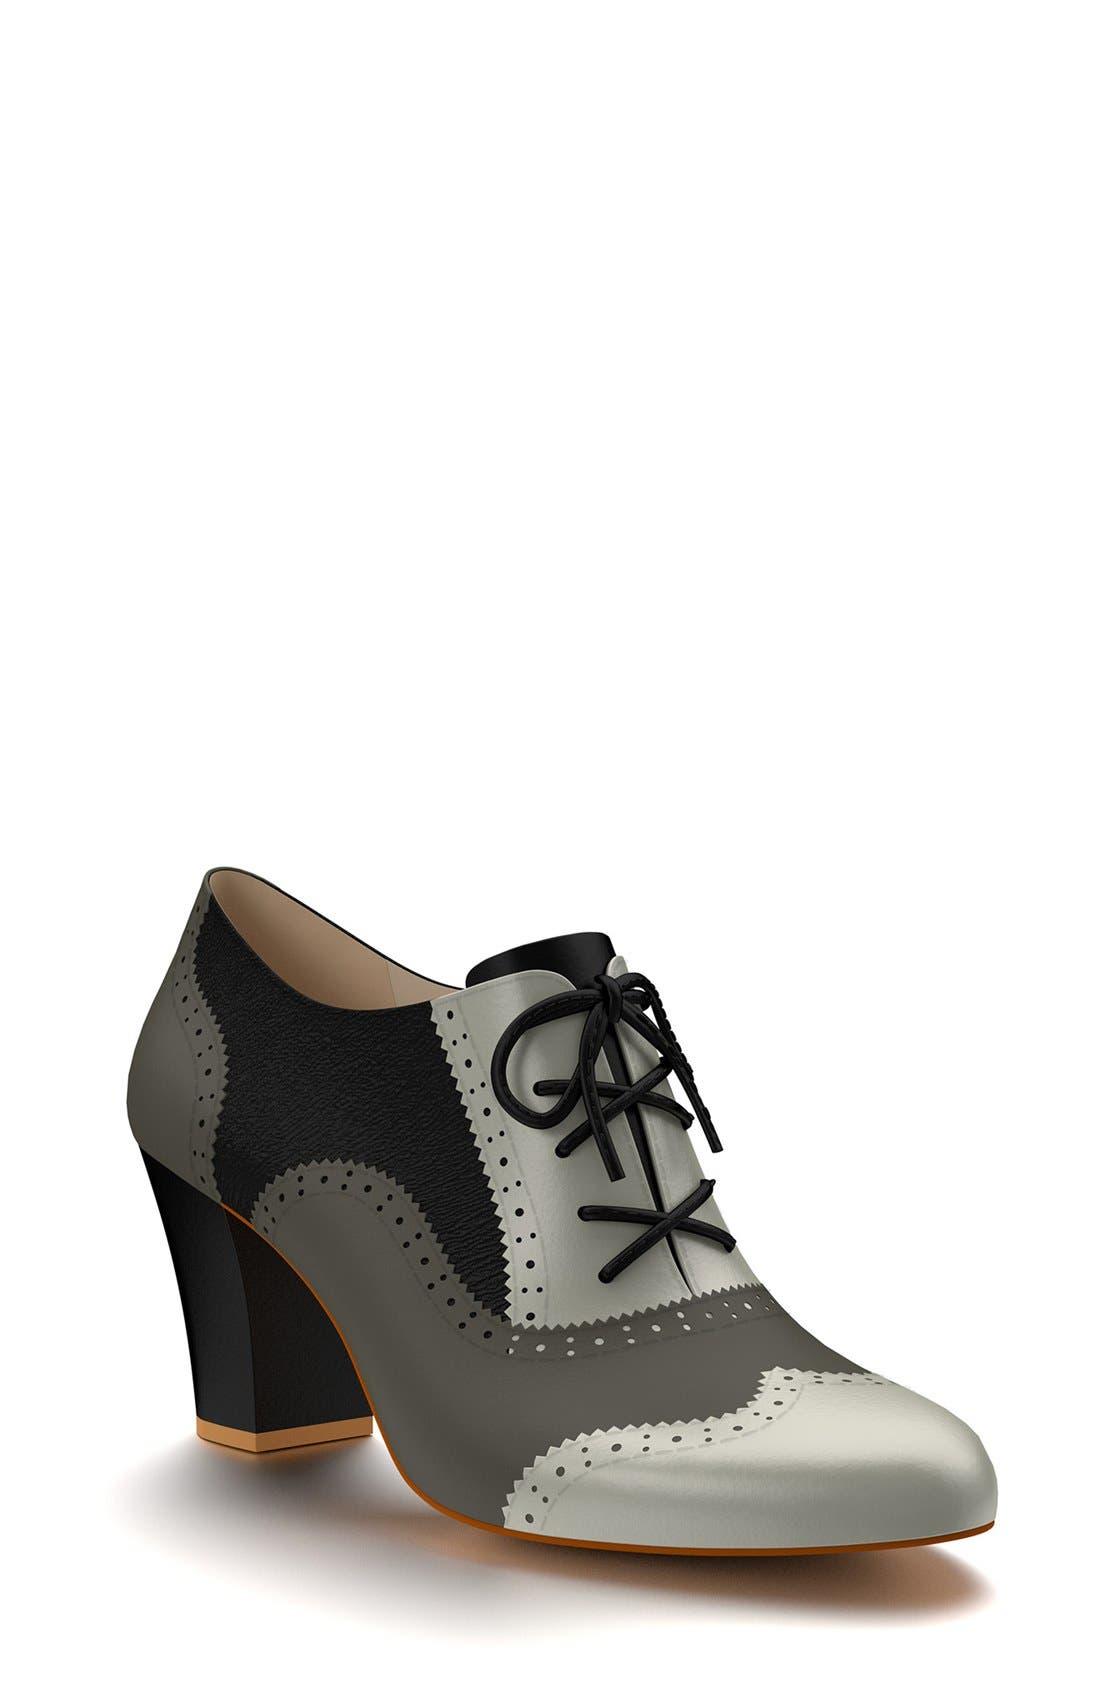 Alternate Image 1 Selected - Shoes of Prey Colorblock Genuine Calf Hair Oxford Bootie (Women)